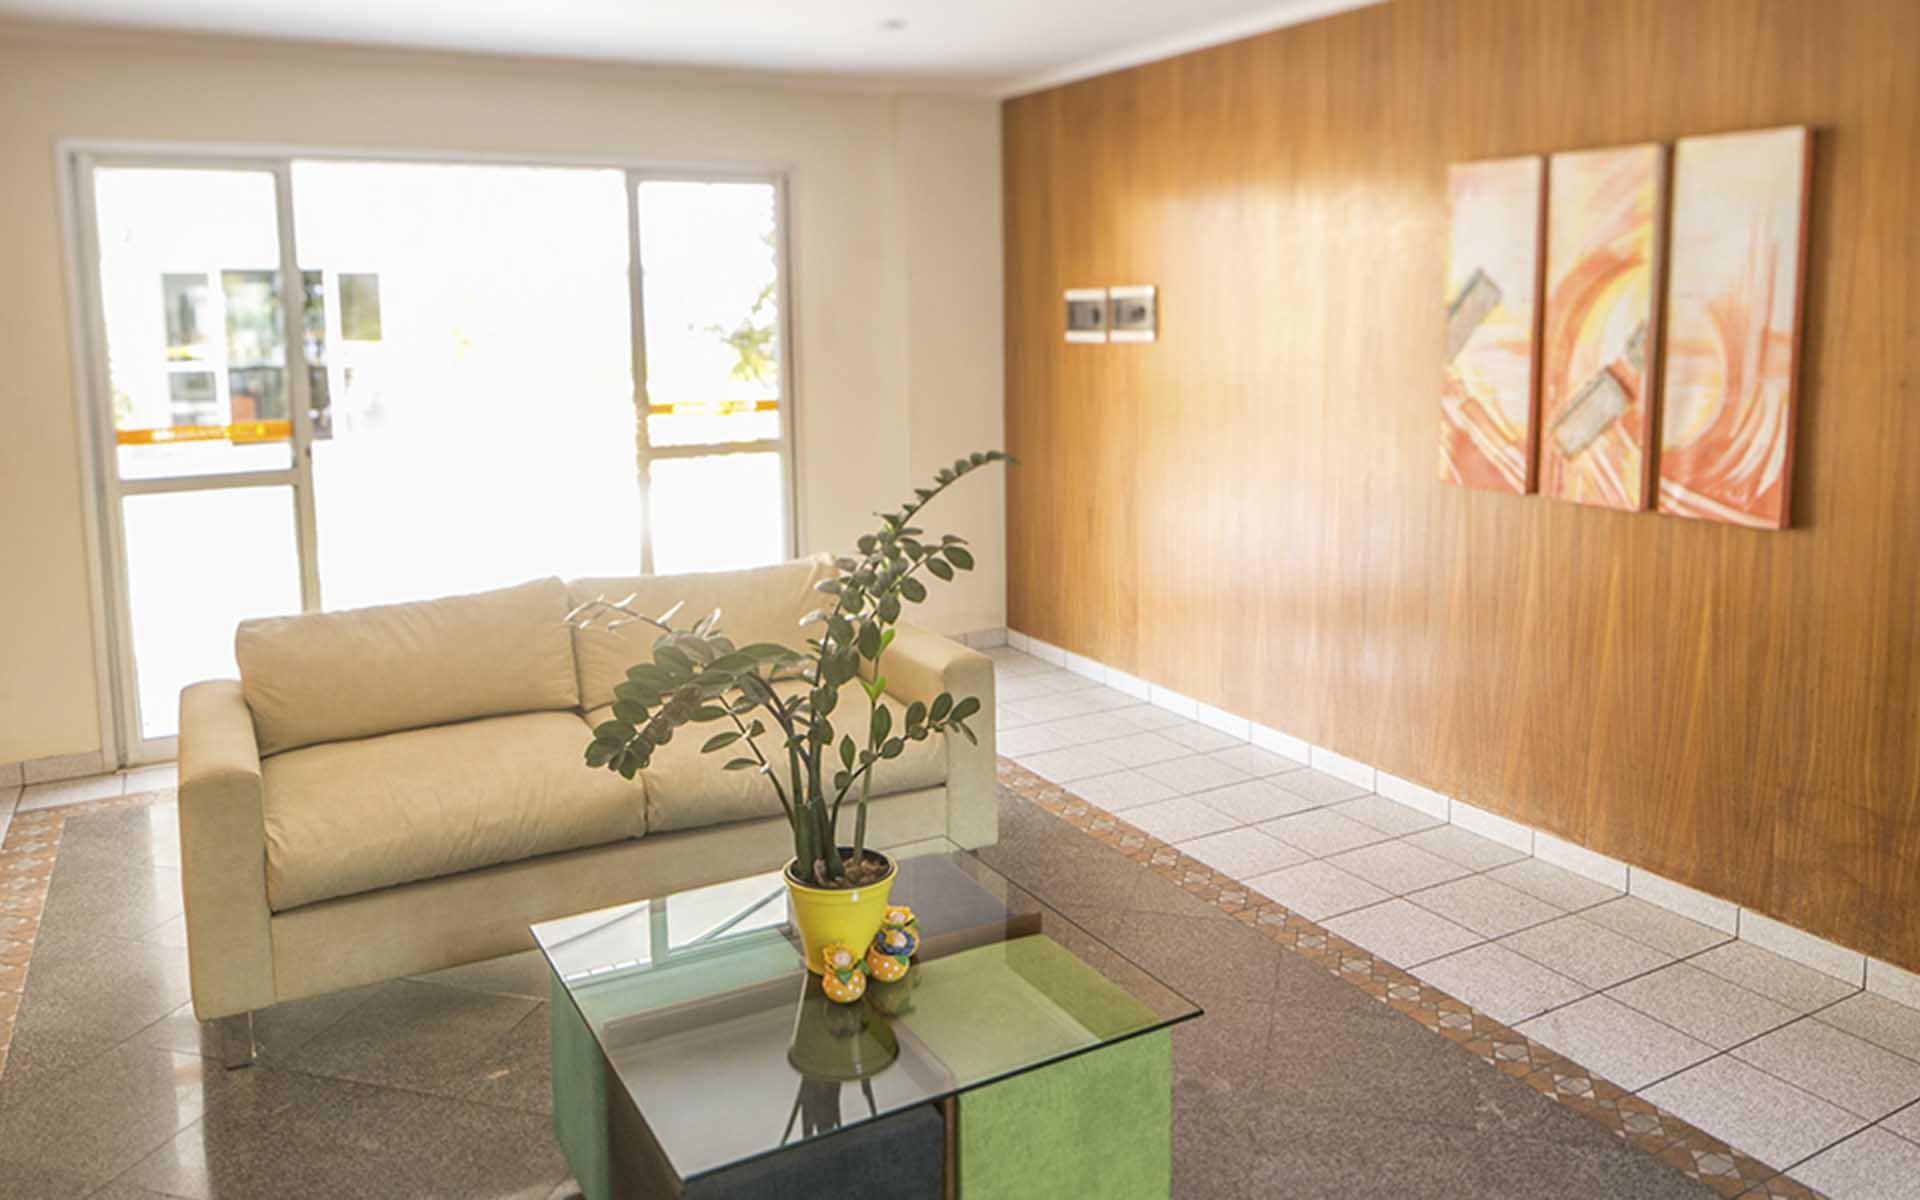 apart hotel flat em brasilia multiparque hplus long stay